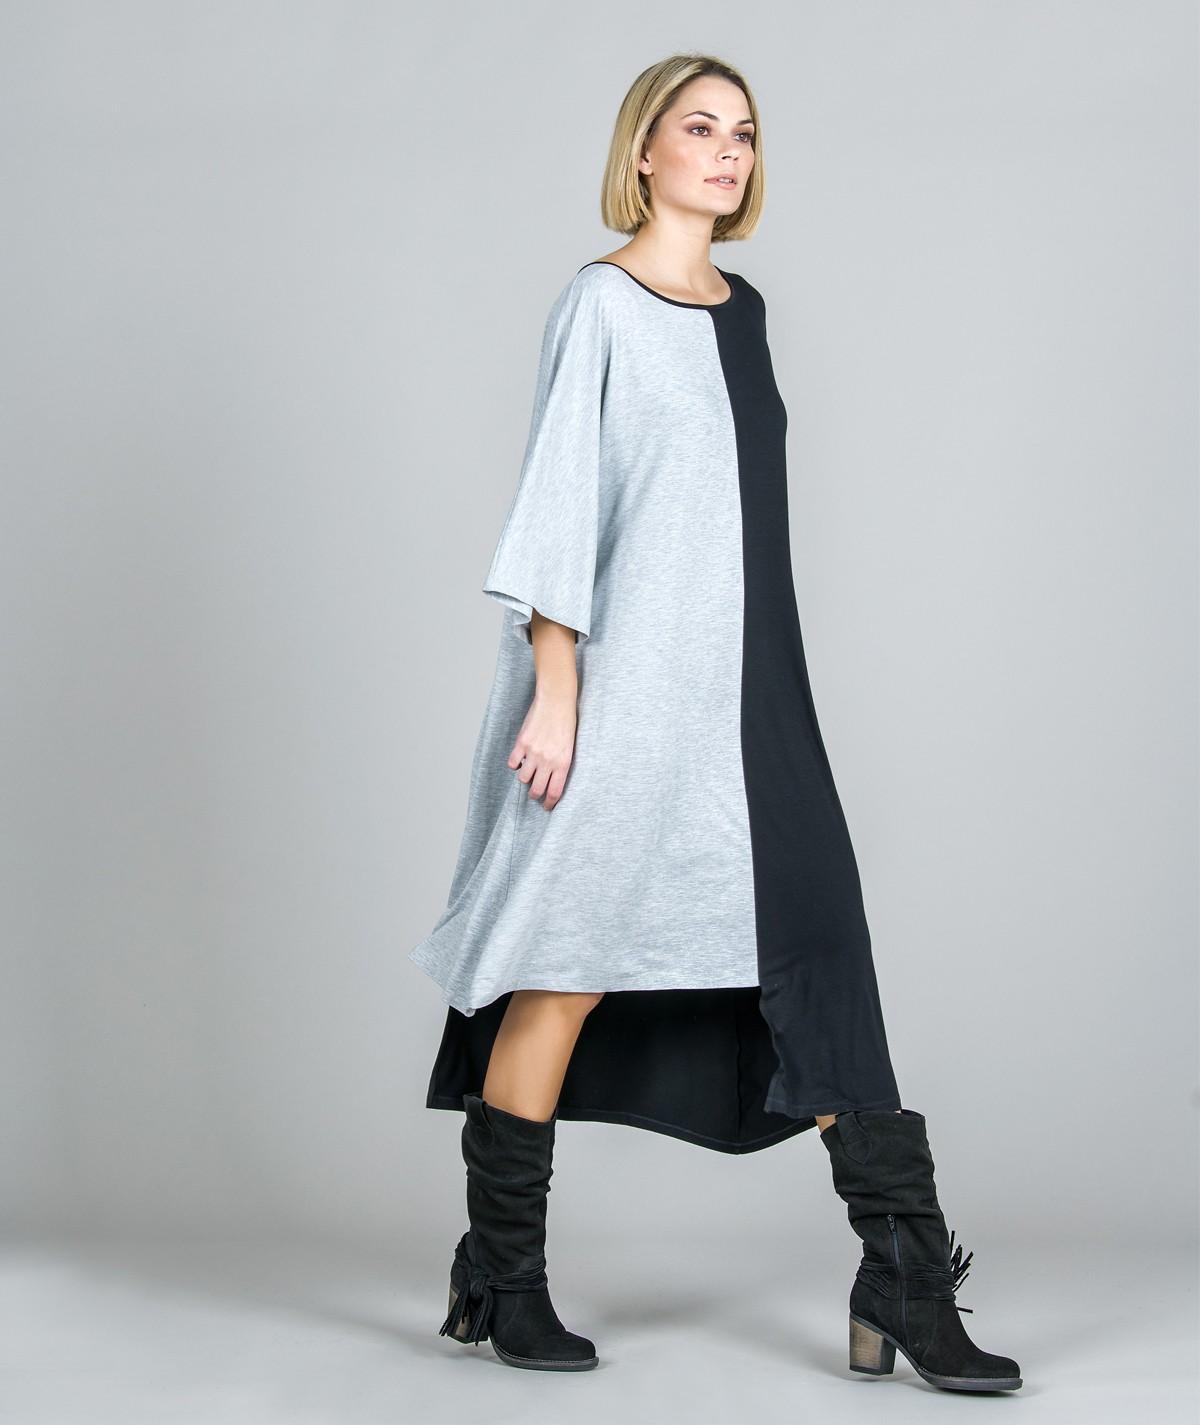 Vestido assimérico Bicolor